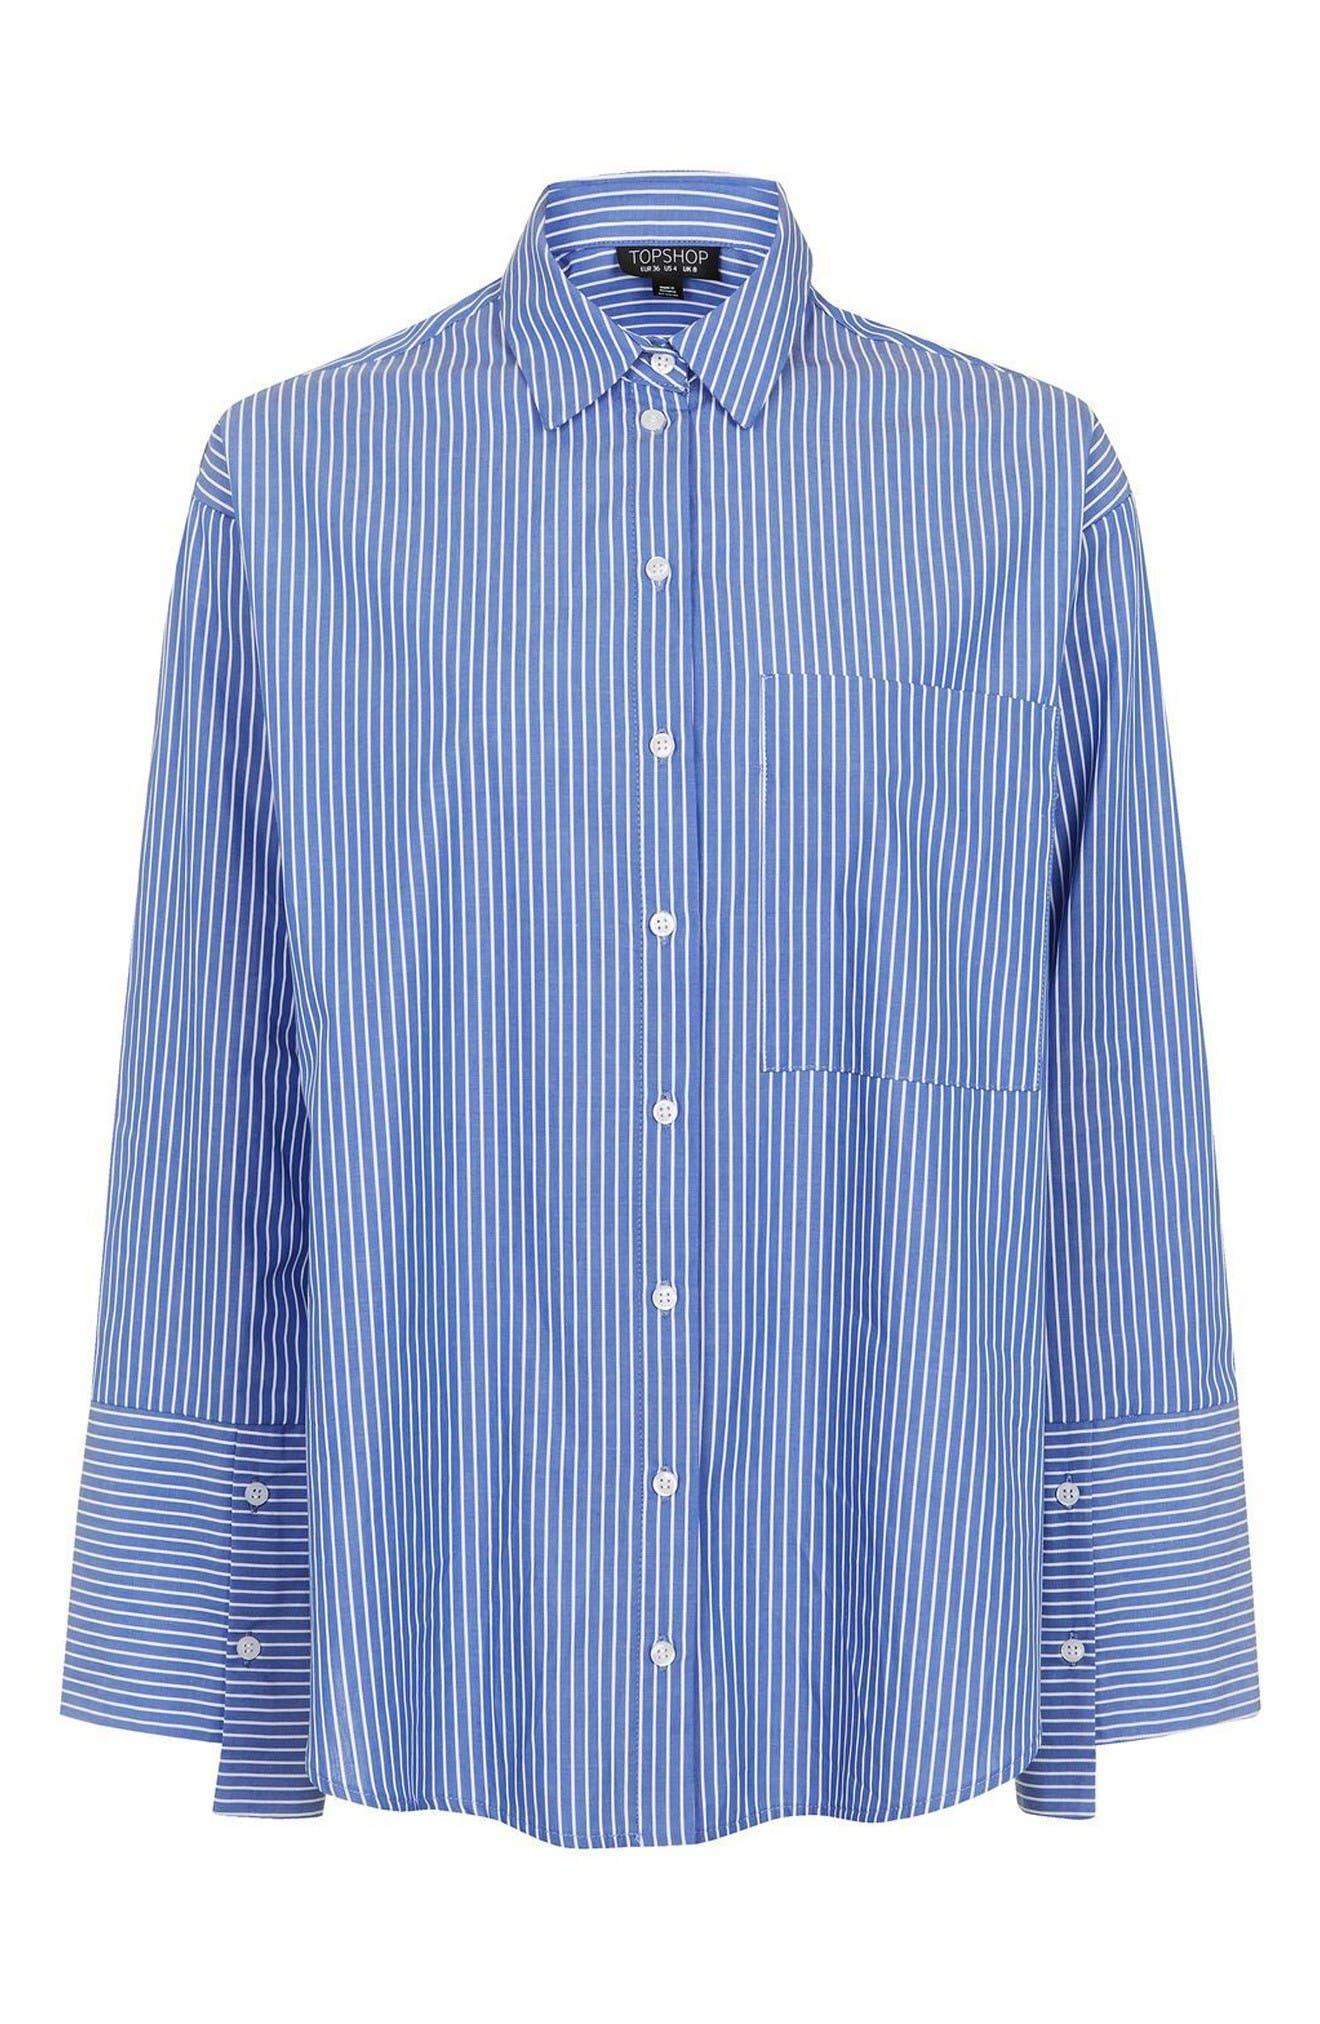 Alternate Image 4  - Topshop Deep Cuff Stripe Shirt